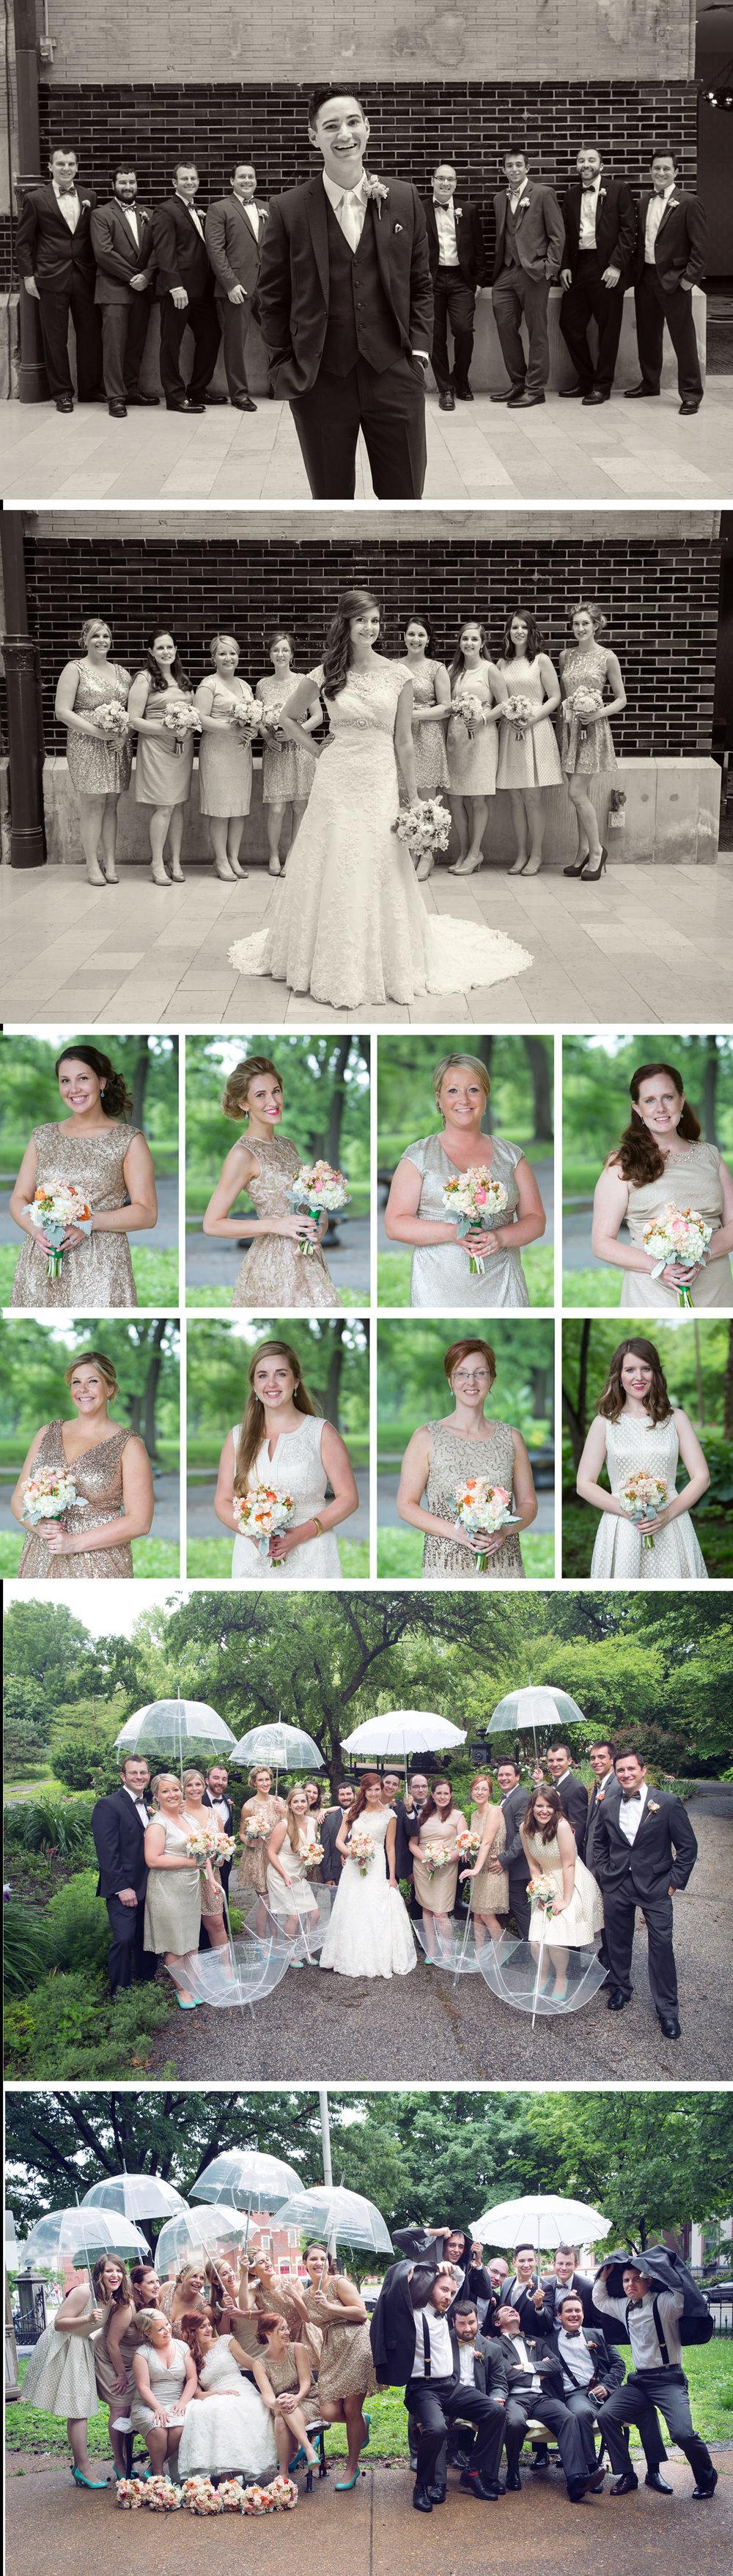 bridalparty4.jpg